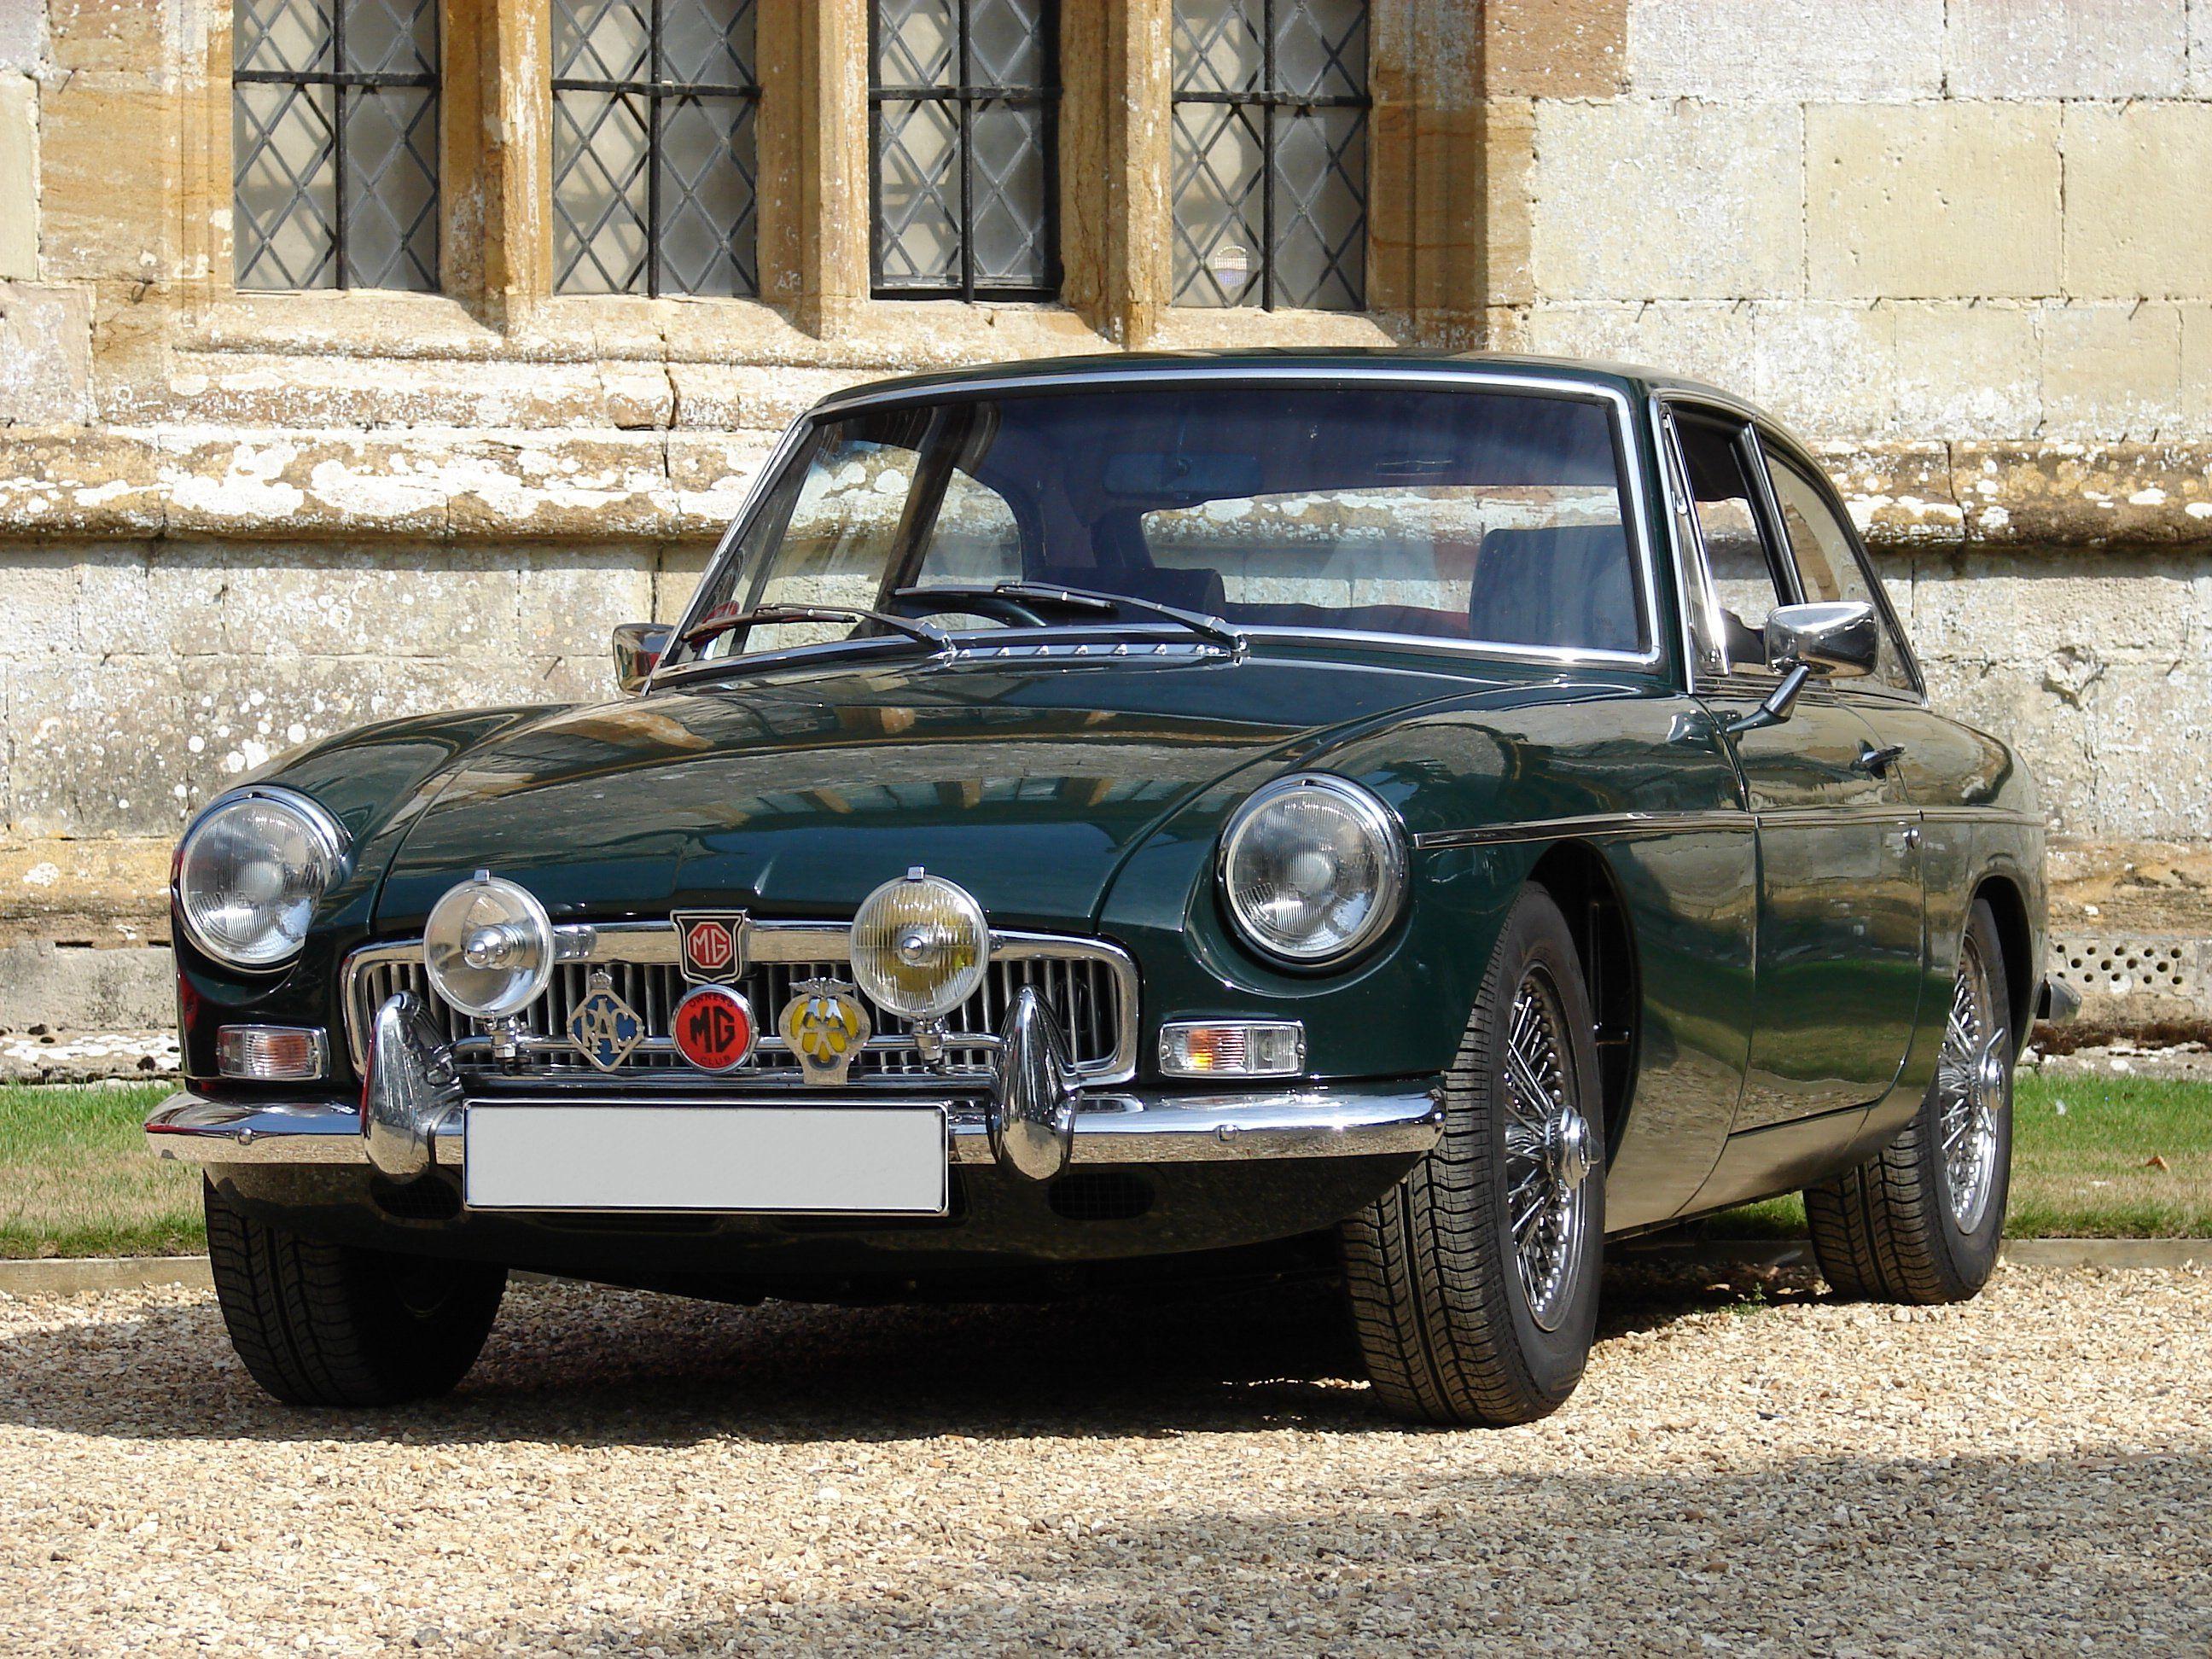 Mgb Gt Www Luxuryaddicted Com  C B British Sports Carscl Ic